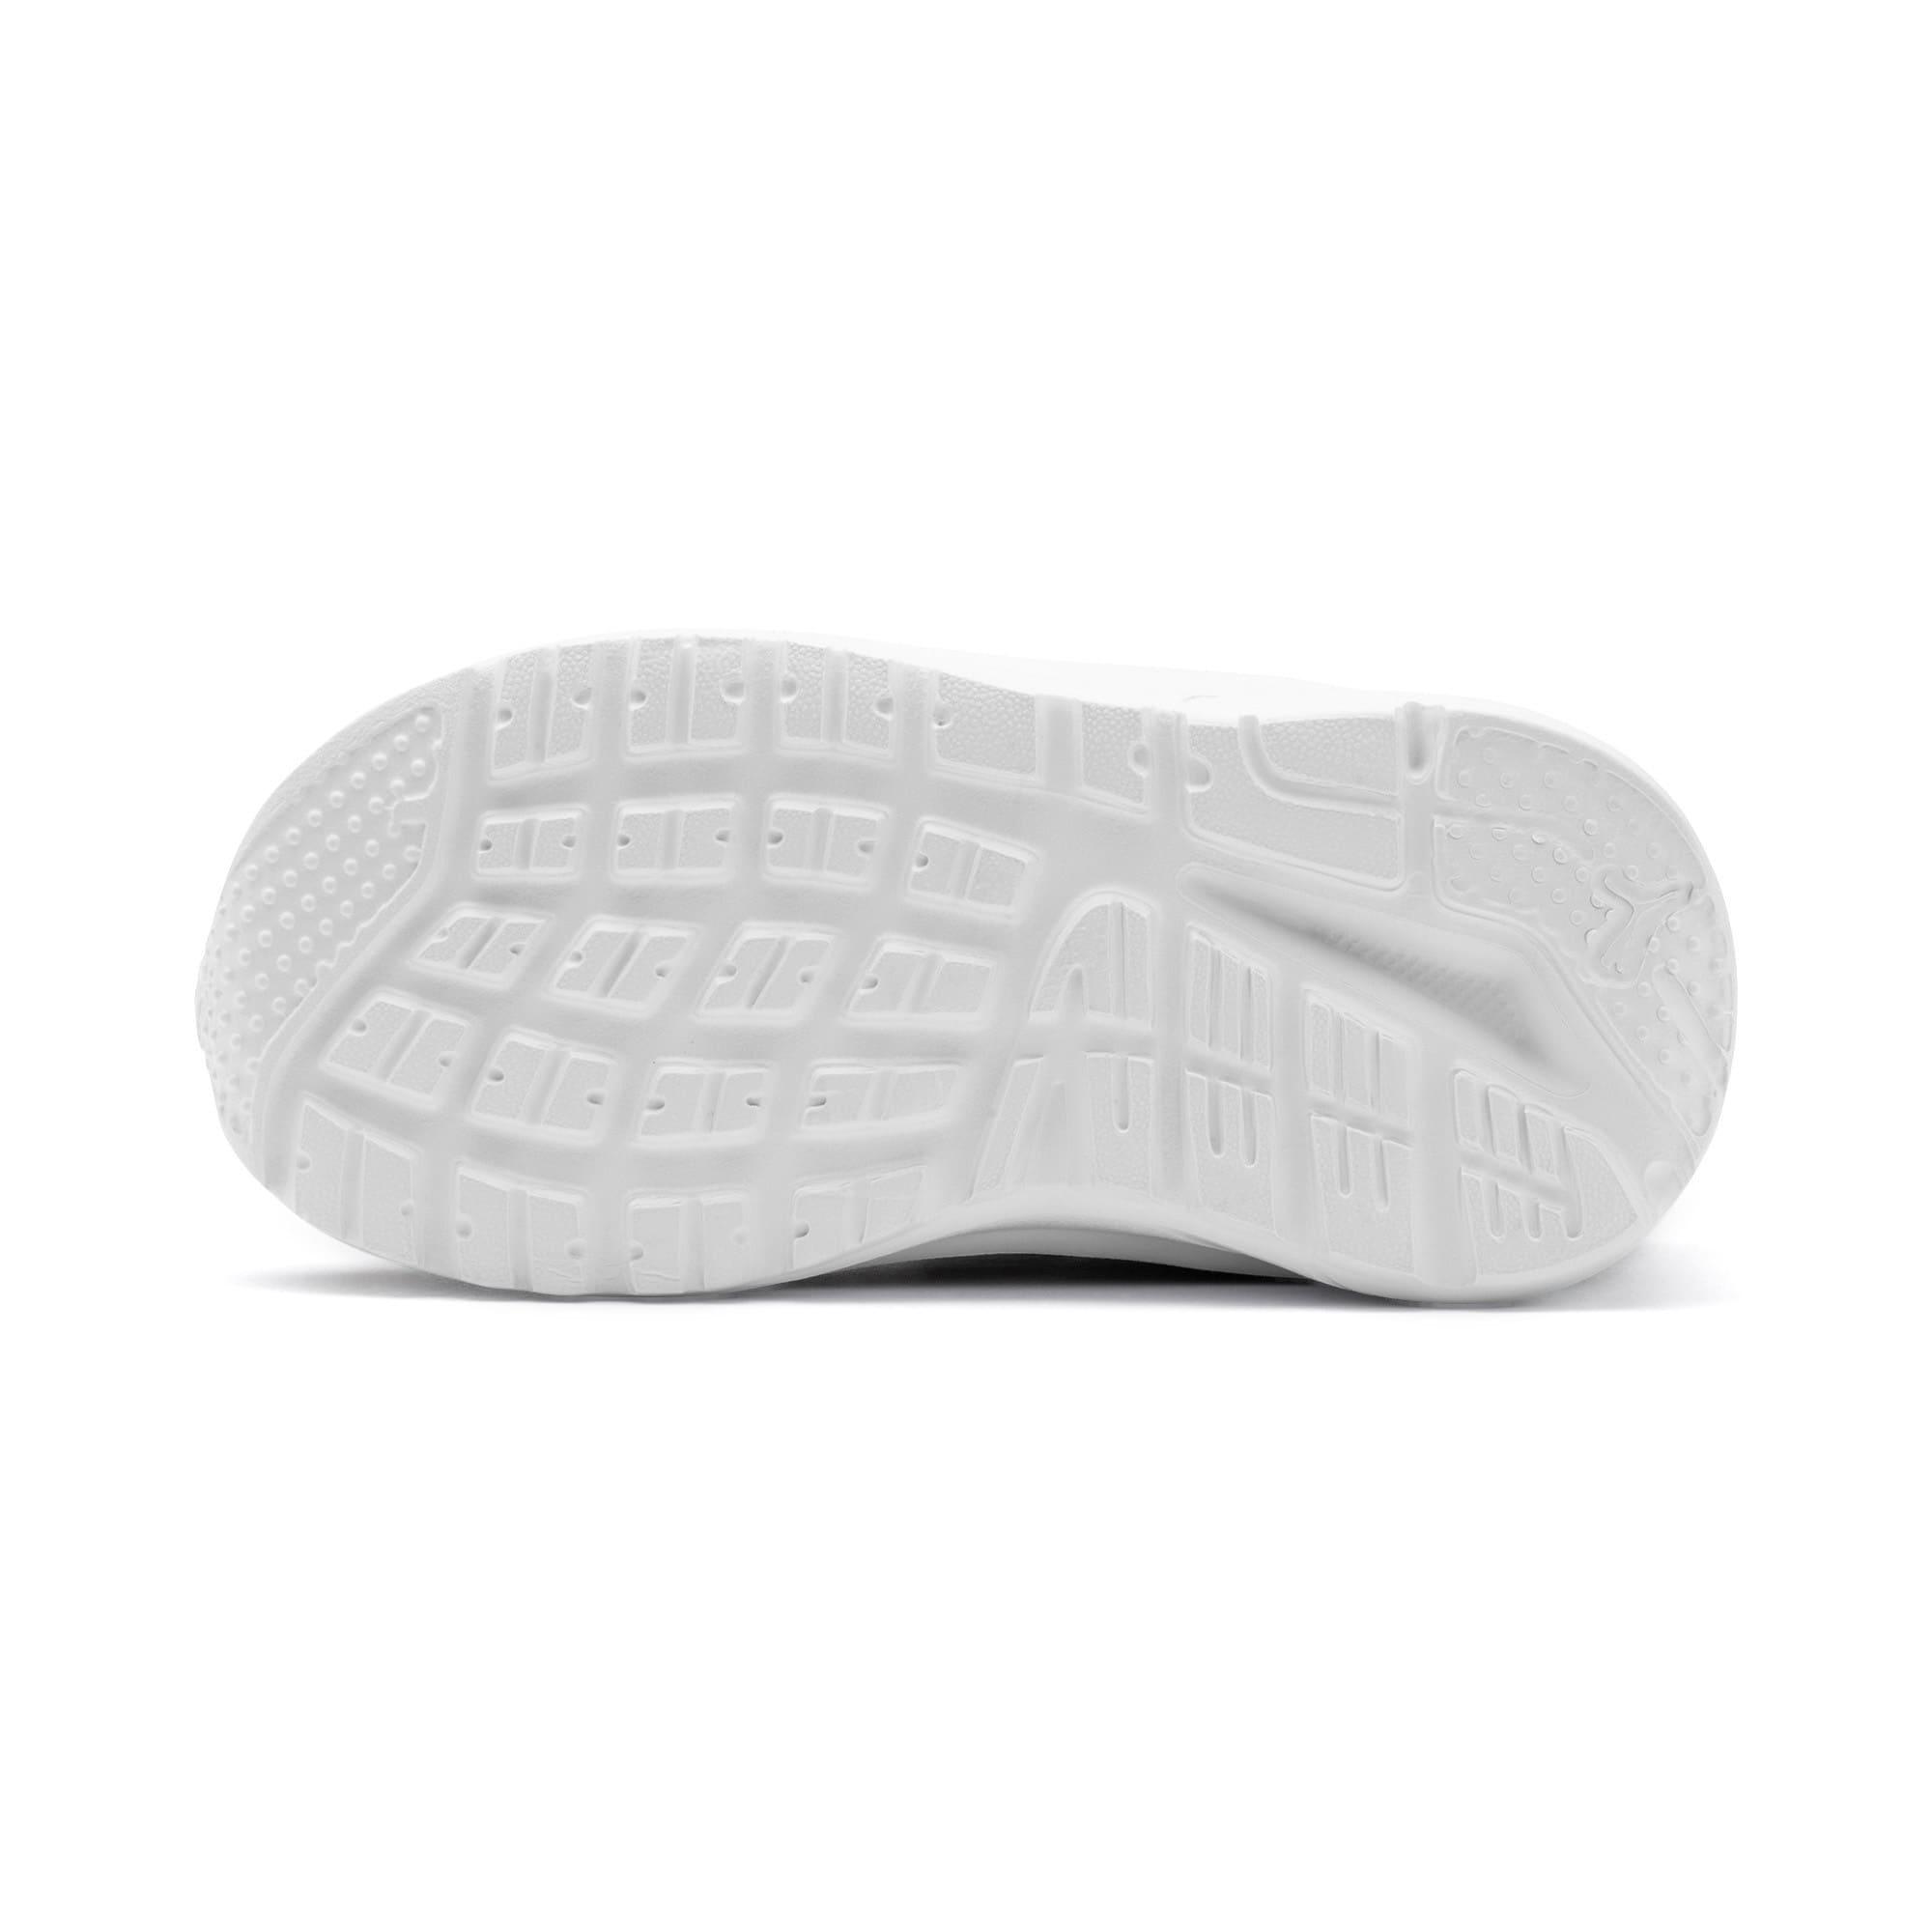 Thumbnail 4 of Pure Jogger Babies Sneaker, Black-Silver-Wht-Nrgy Yellow, medium